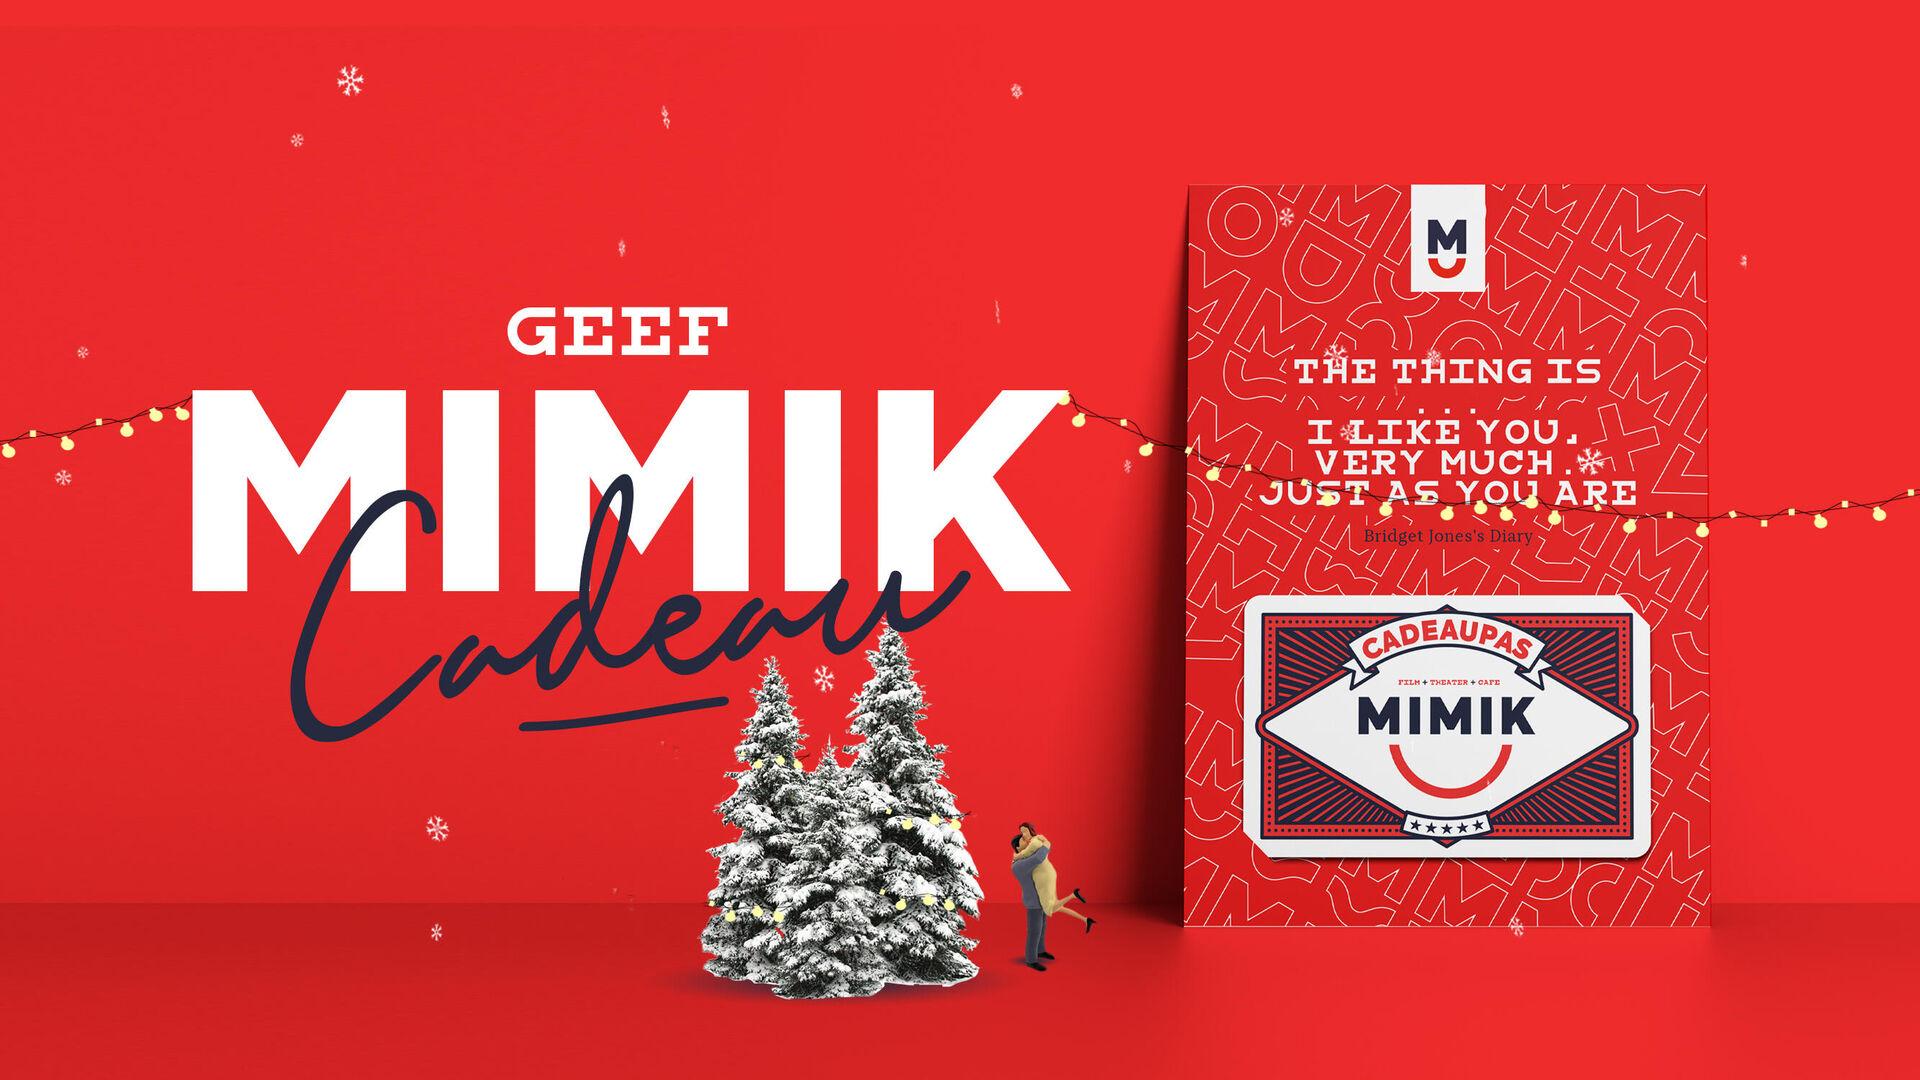 Geef MIMIK Cadeau